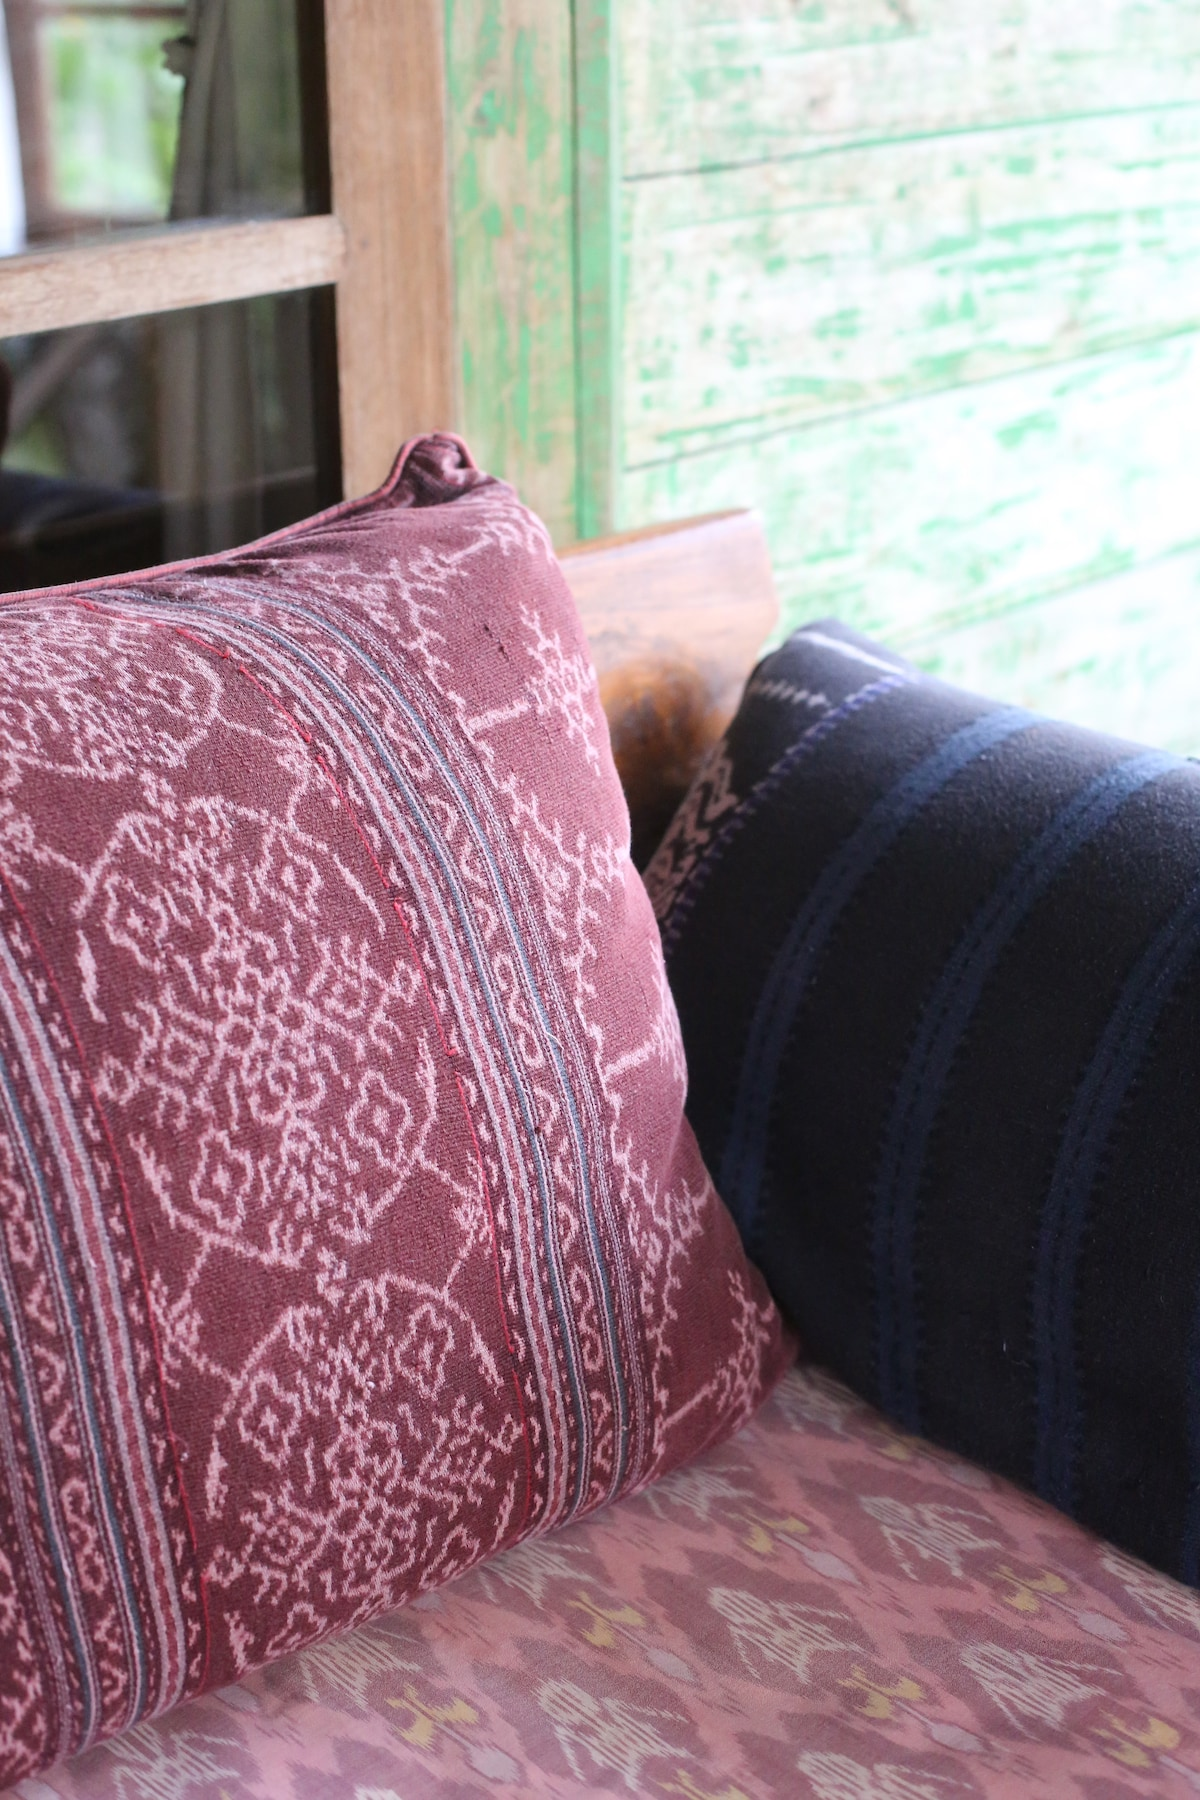 Indonesian woven ikat fabrics